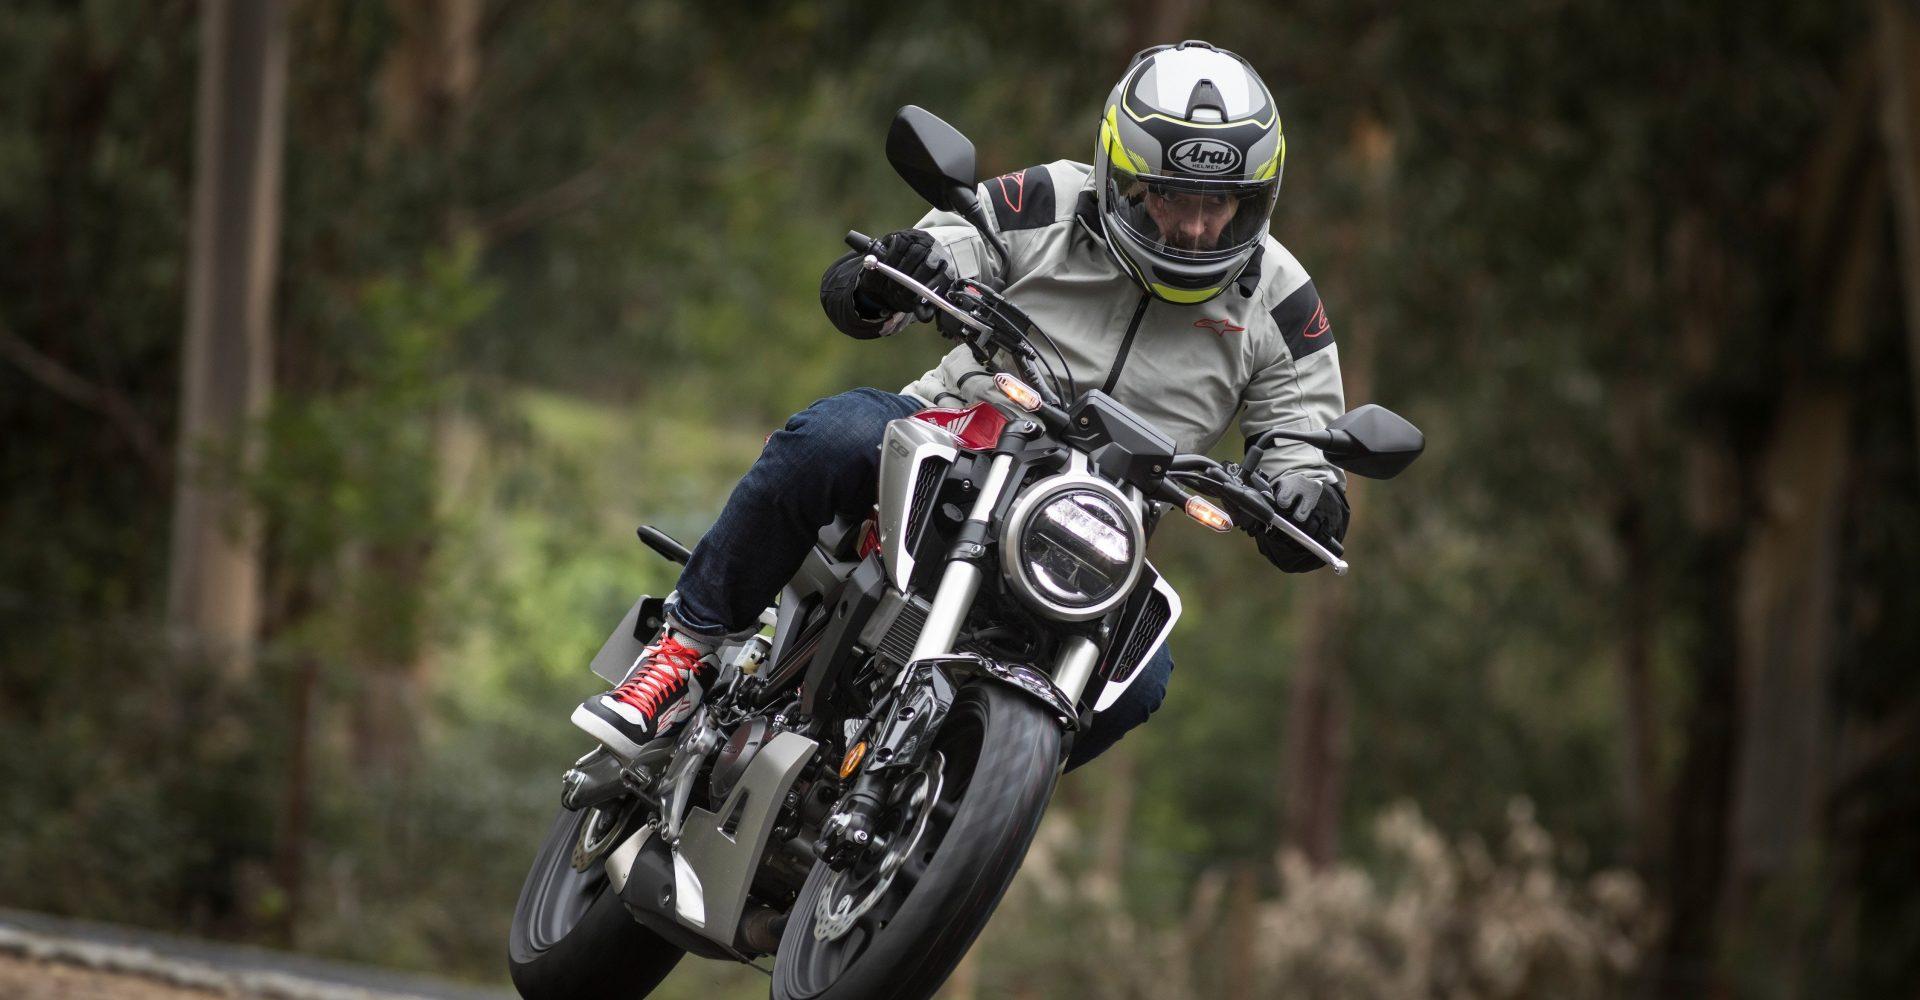 First Ride: Honda's CB125R packs big-bike fun on a smaller scale